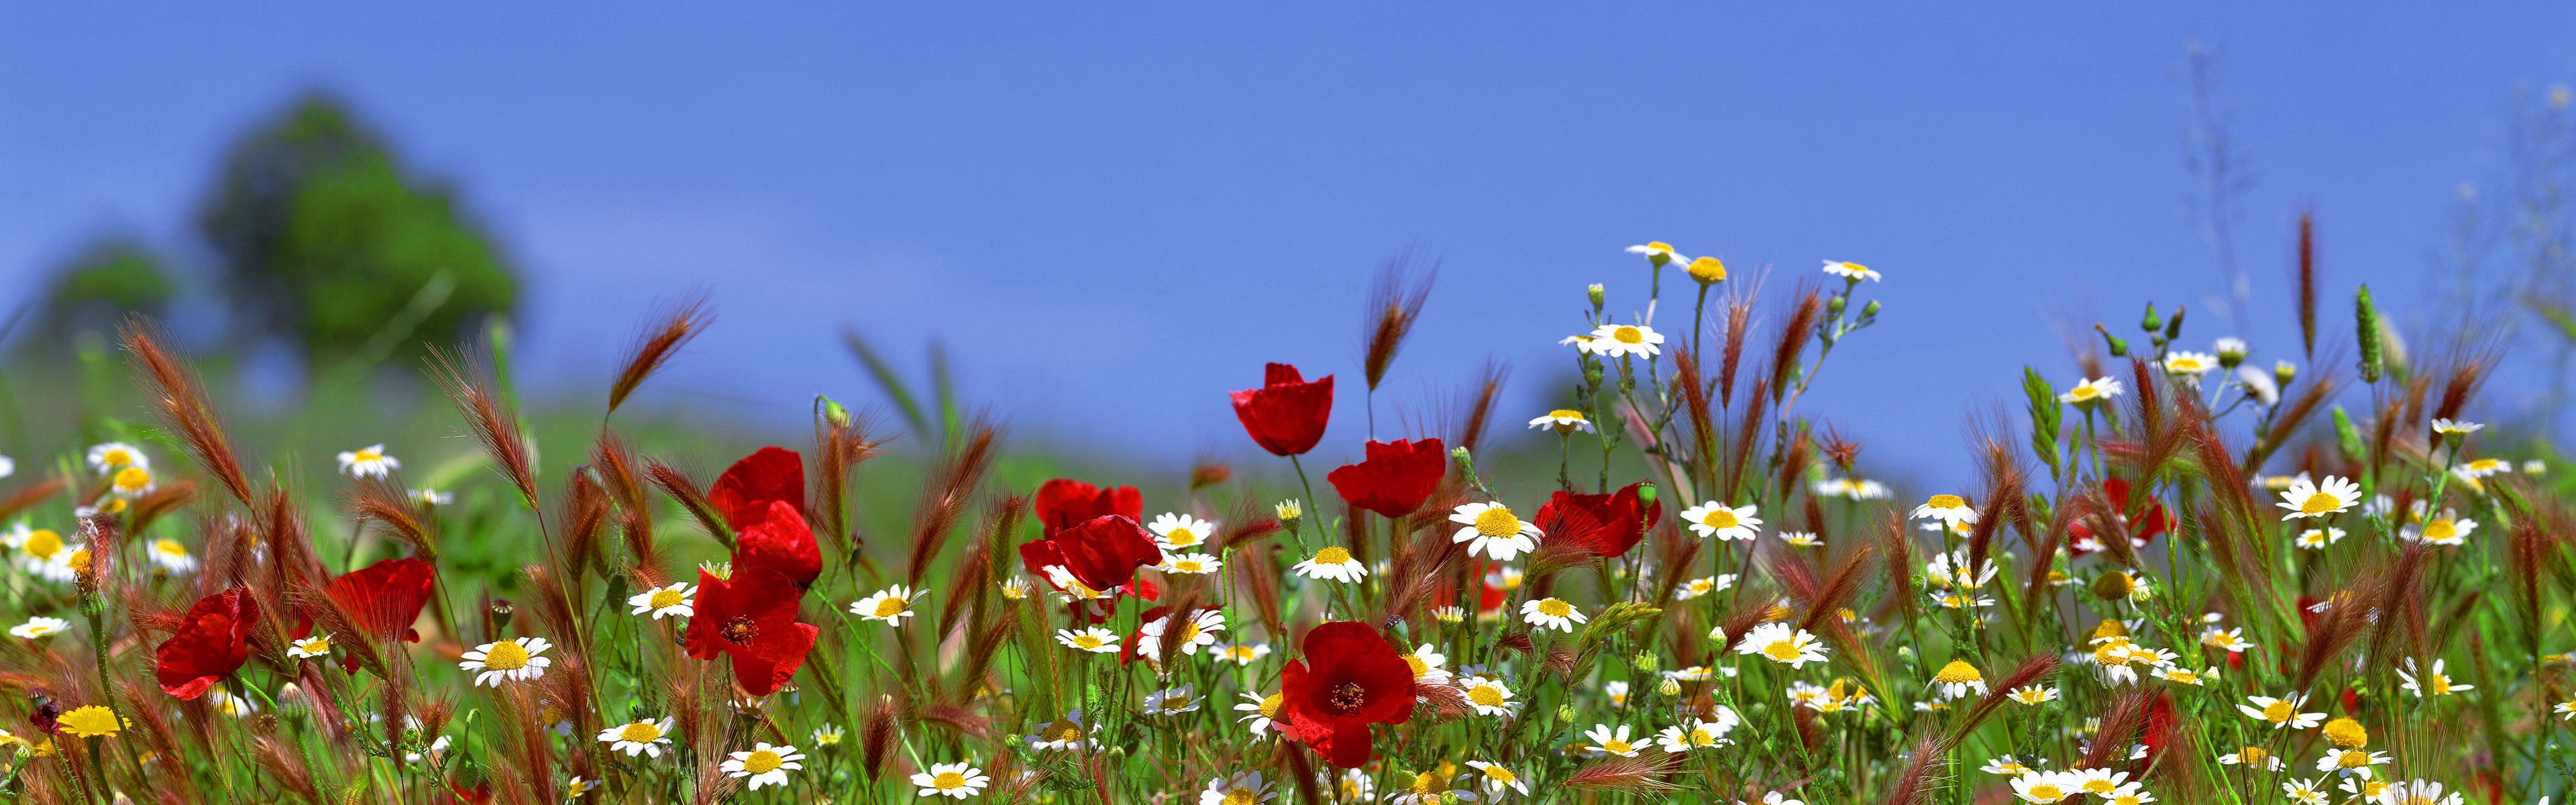 Flower Landscape Wallpaper - WallpaperSafari